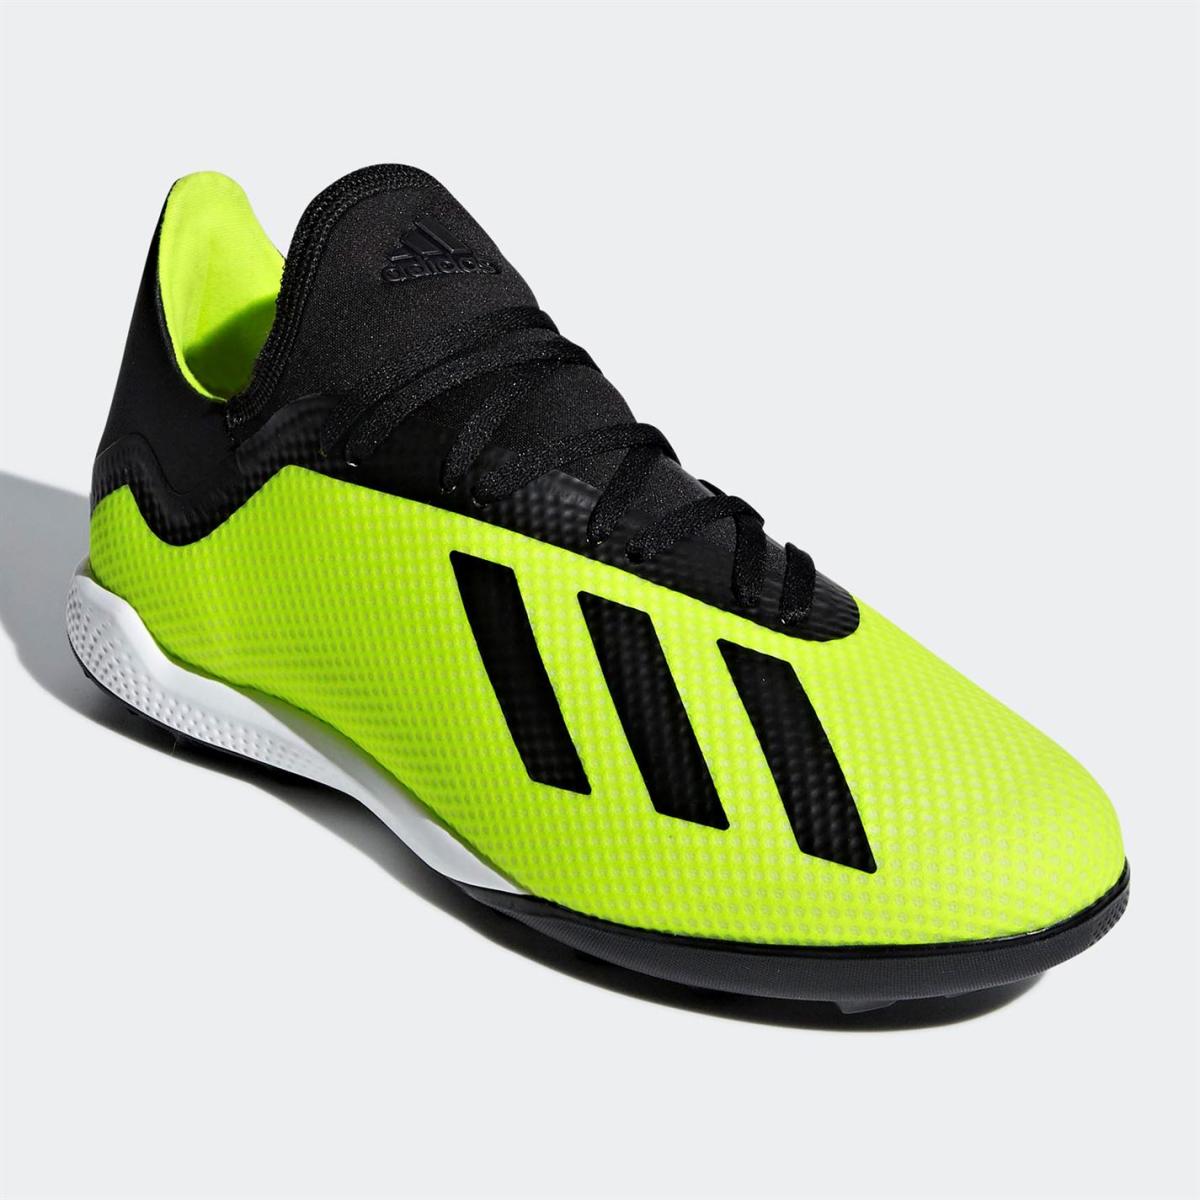 adidas X Tango 18.3 Herren AT Astro Turf Kunstrasen Fußballschuhe